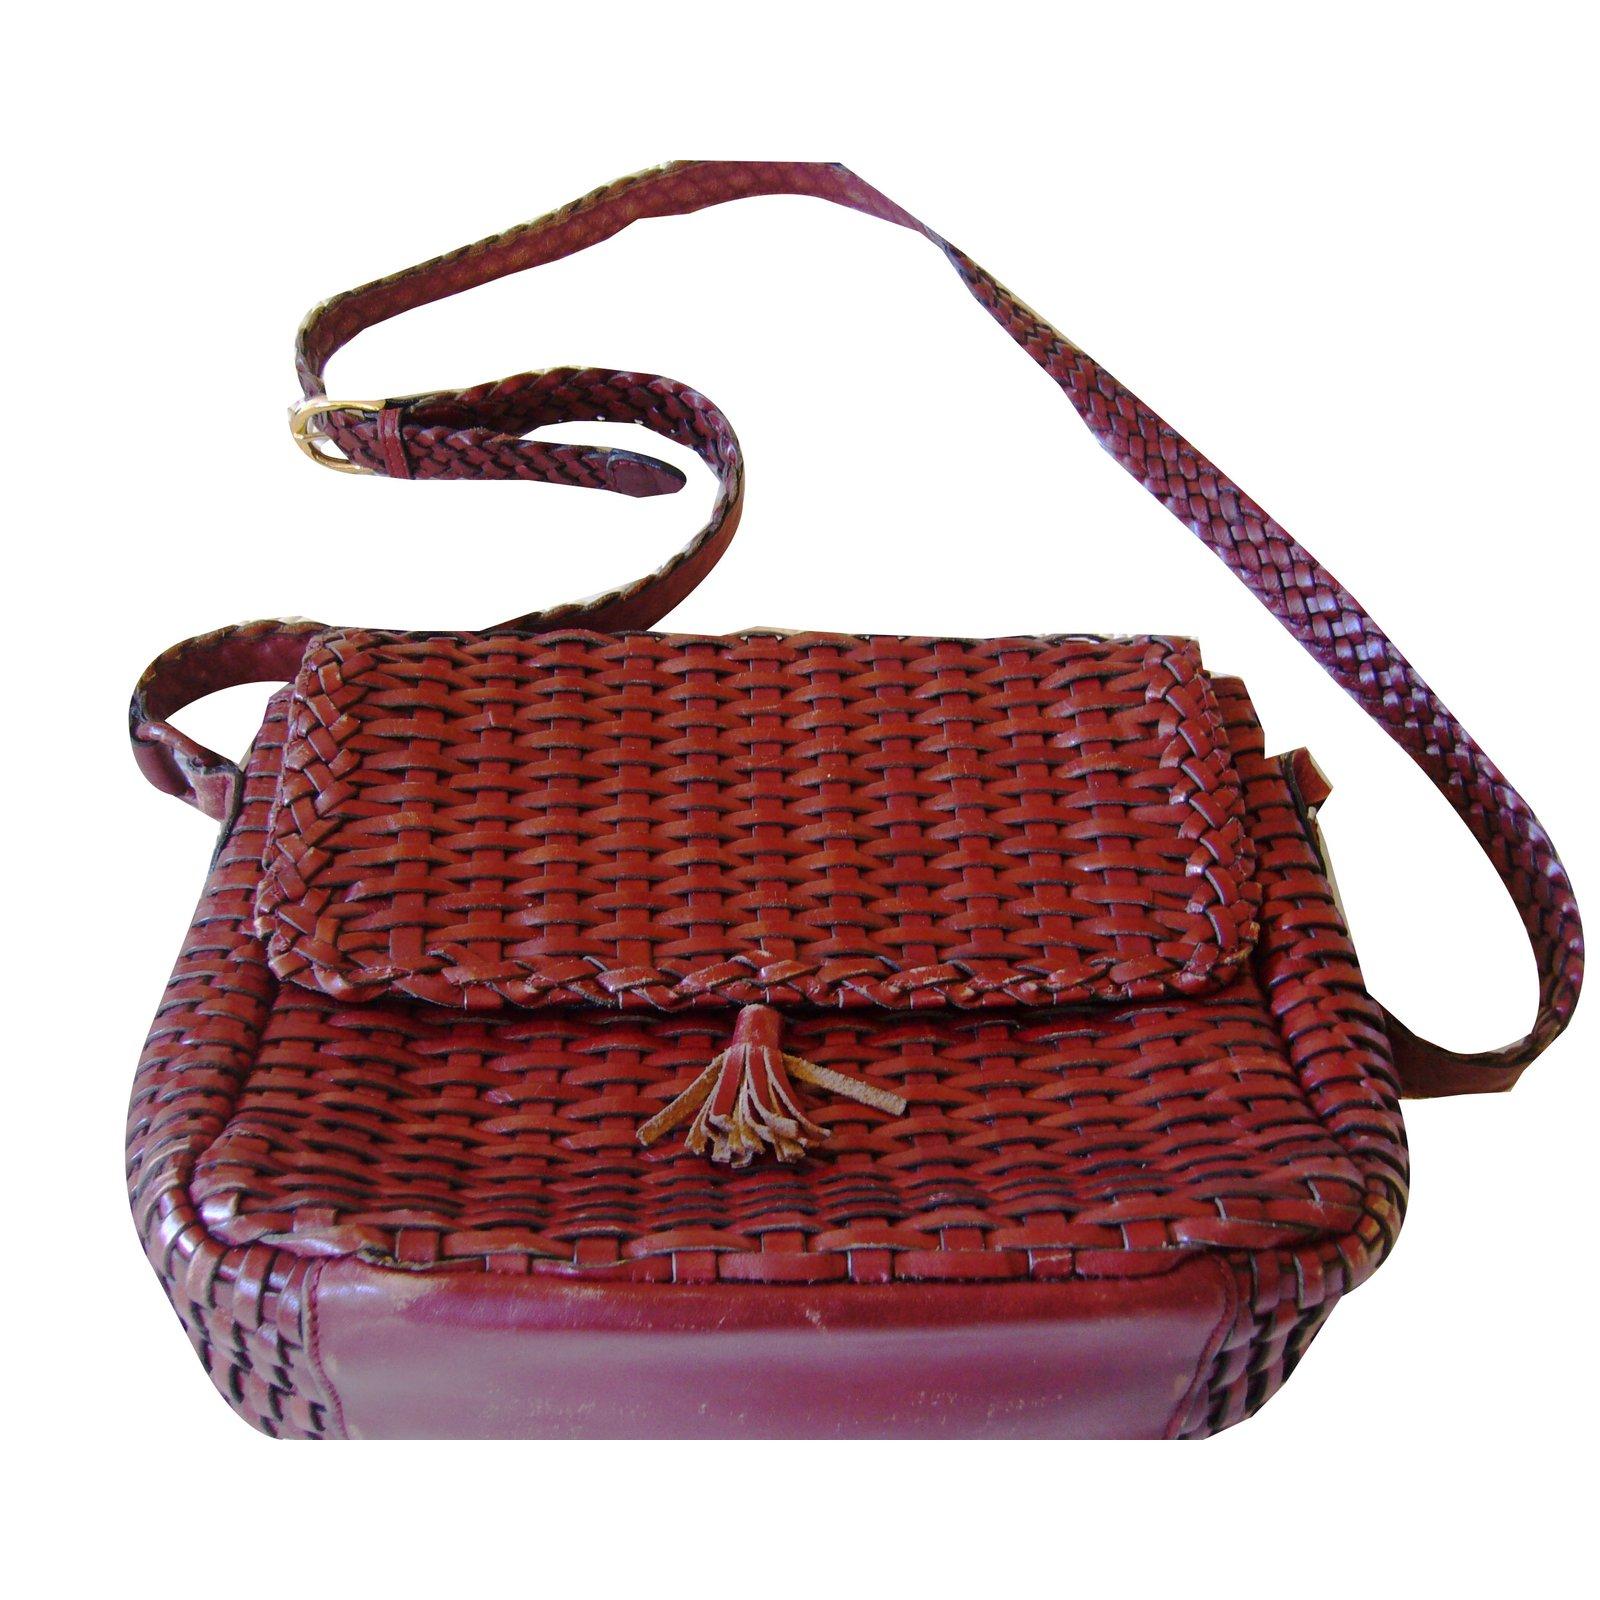 Autre Marque Talbots Handbags Leather Chestnut Ref 42017